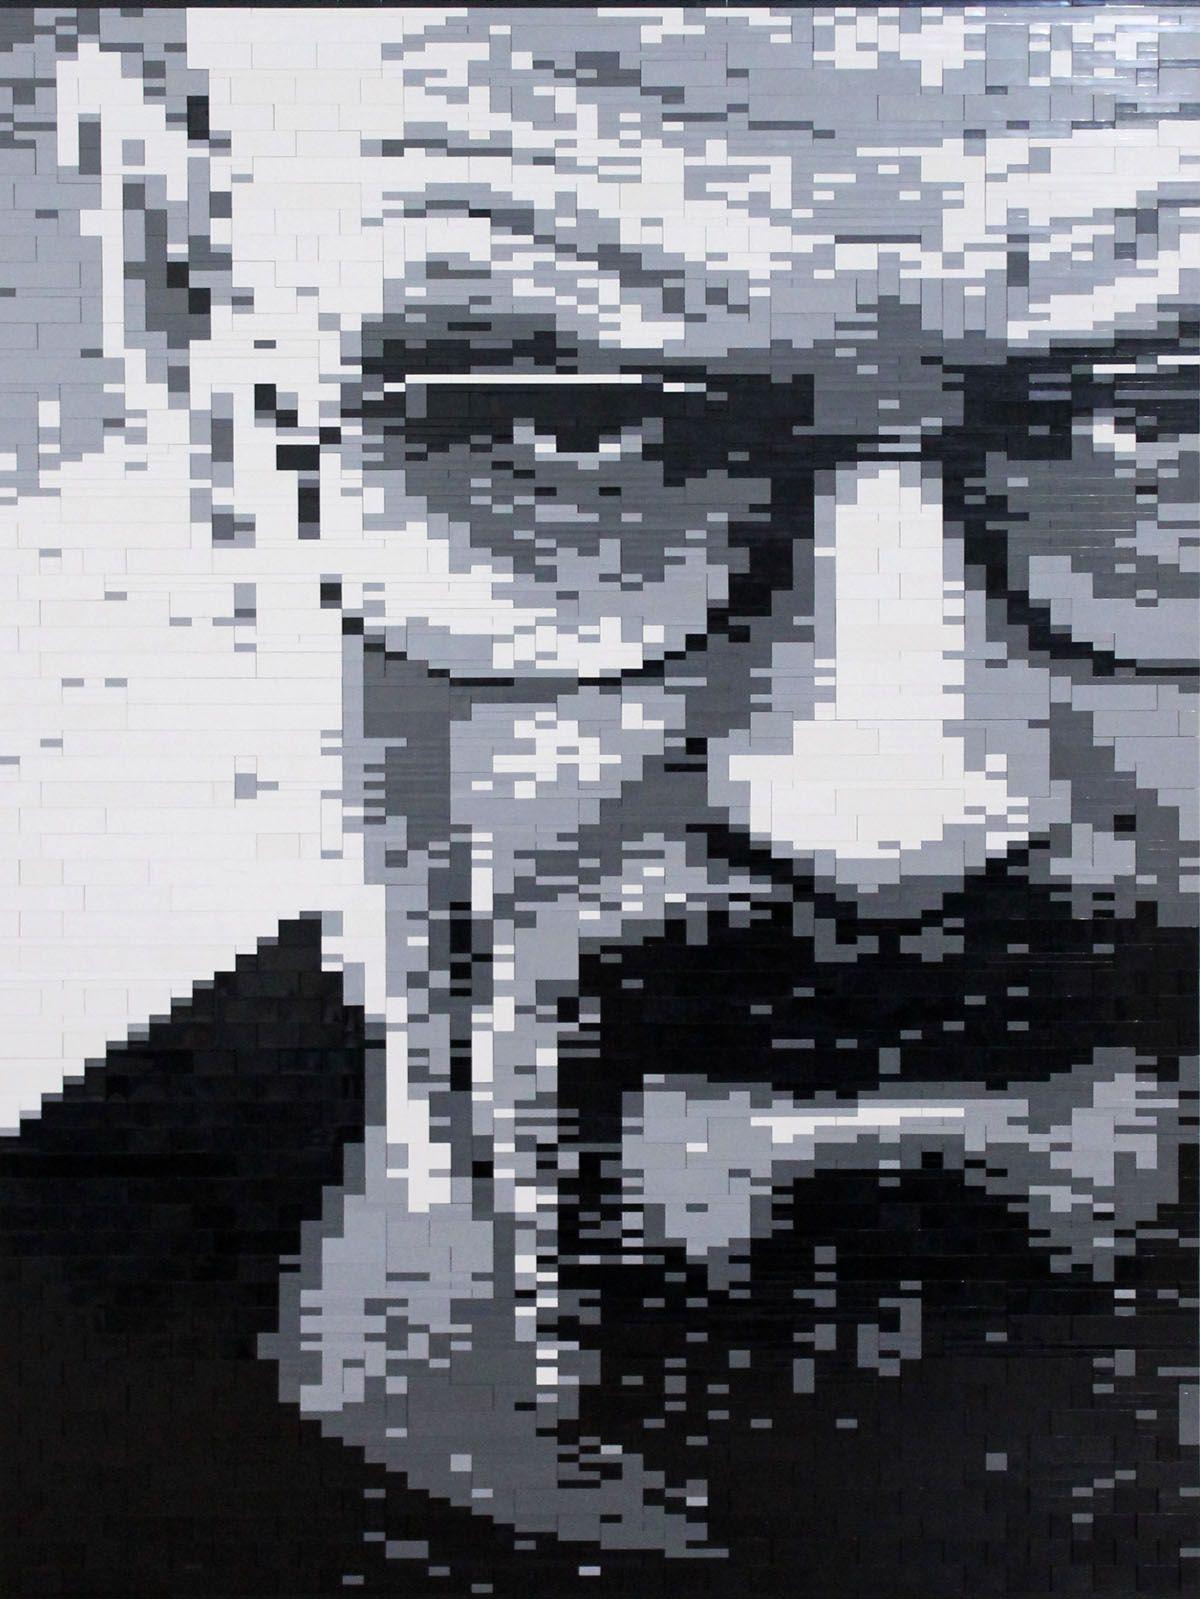 Walter White Lego Mosaic